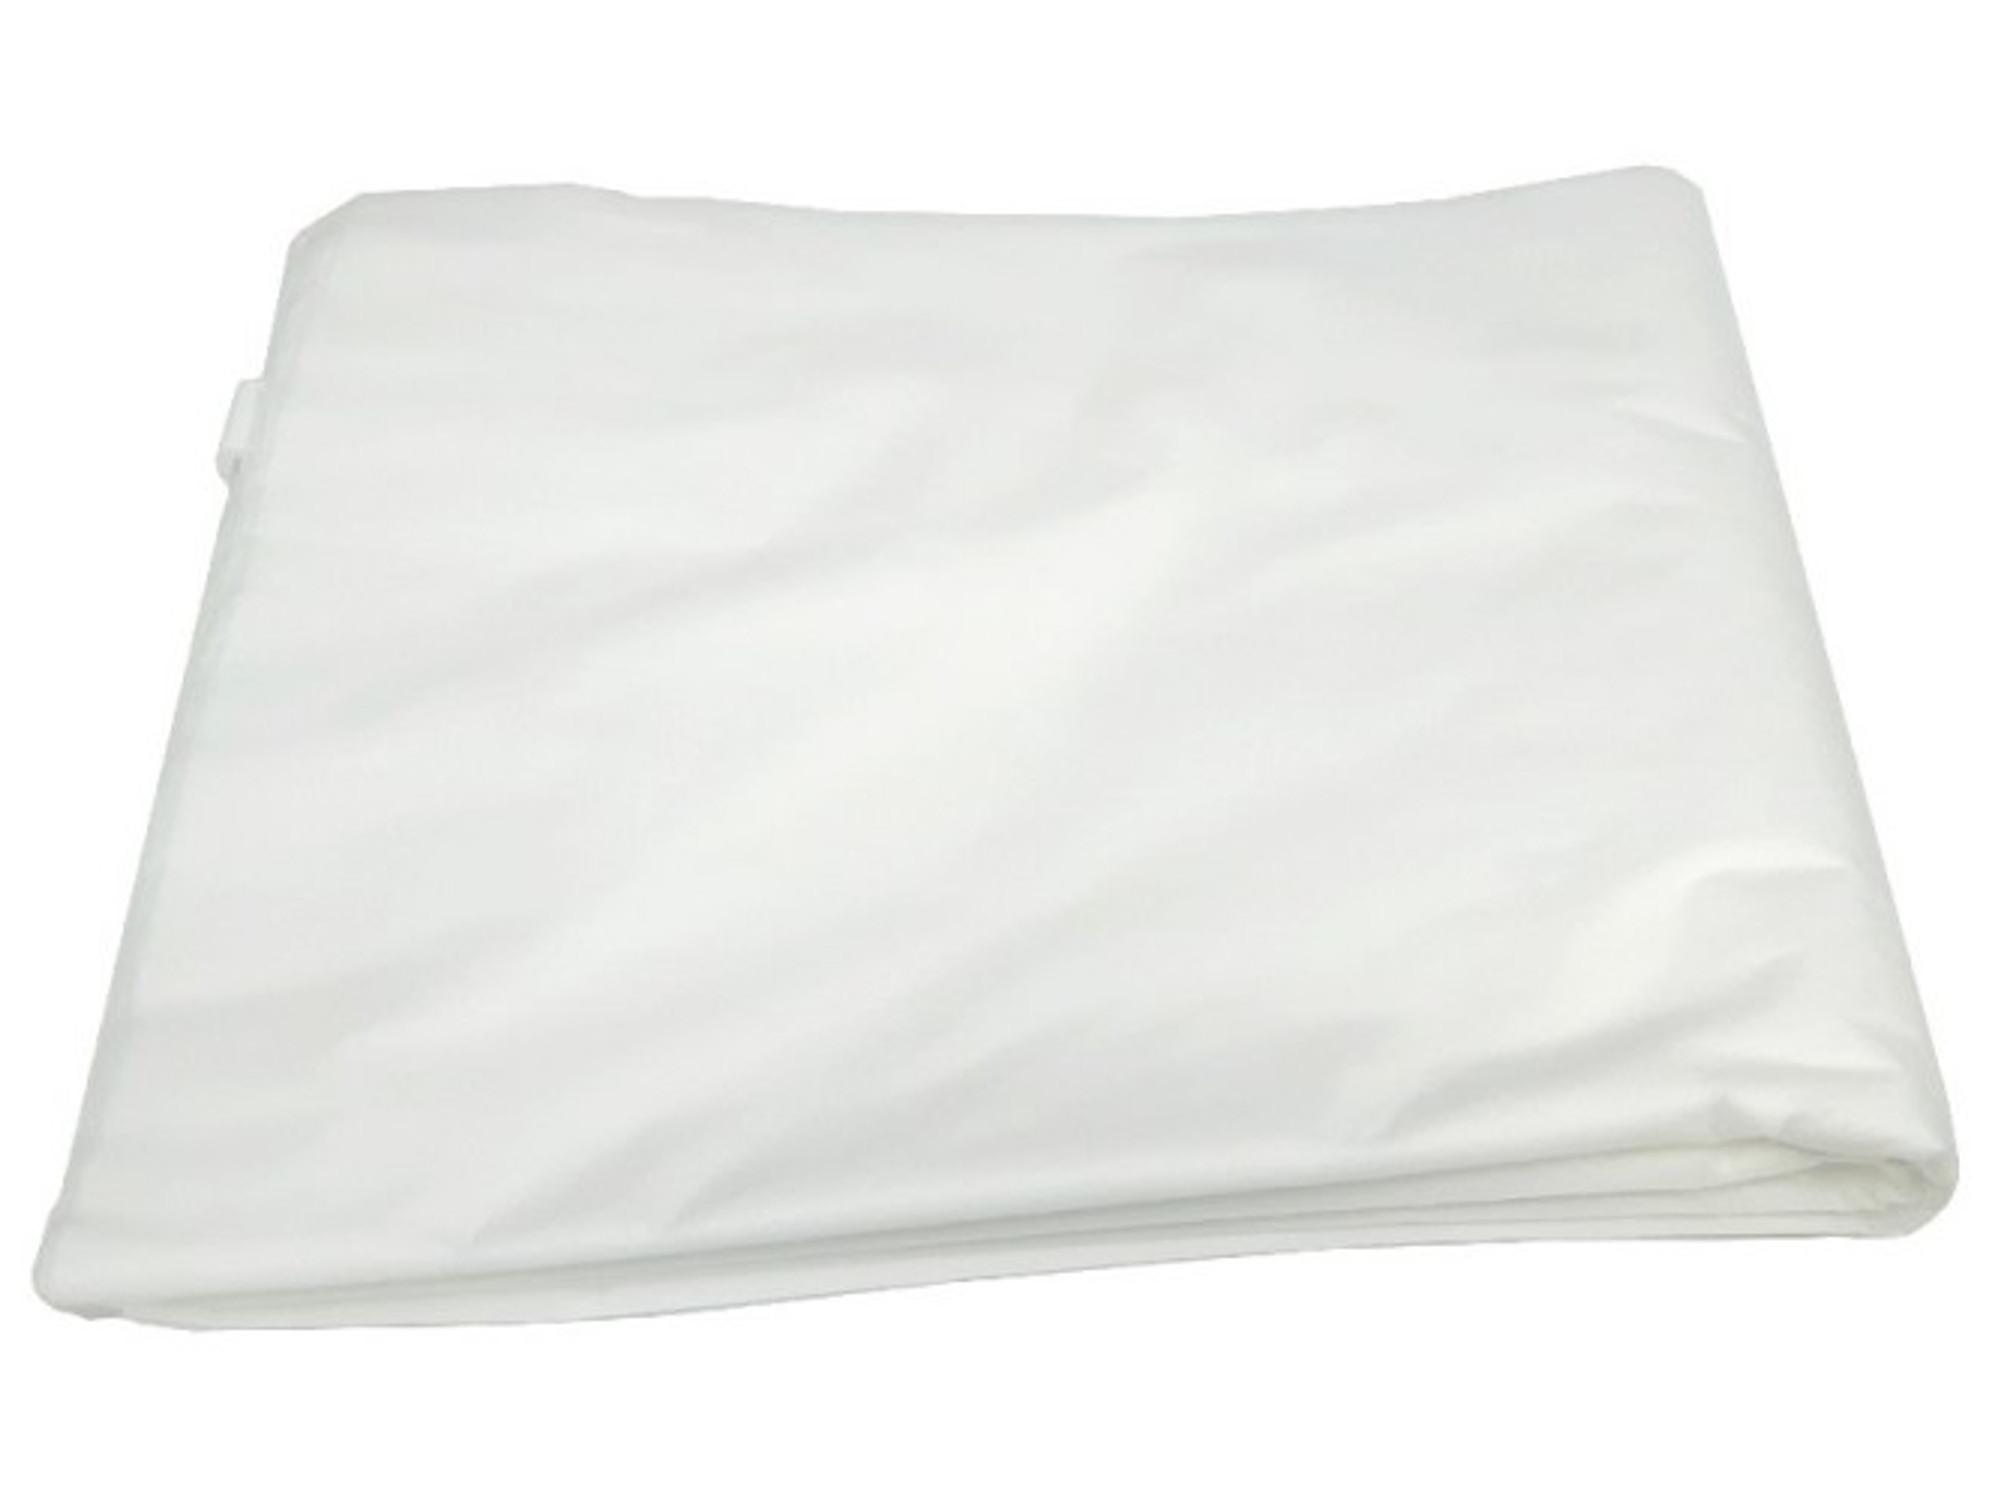 Jednorázová kadeřnická pláštěnka z netkané textílie Eko-Higiena - 25 ks (F/024/025F) + DÁREK ZDARMA